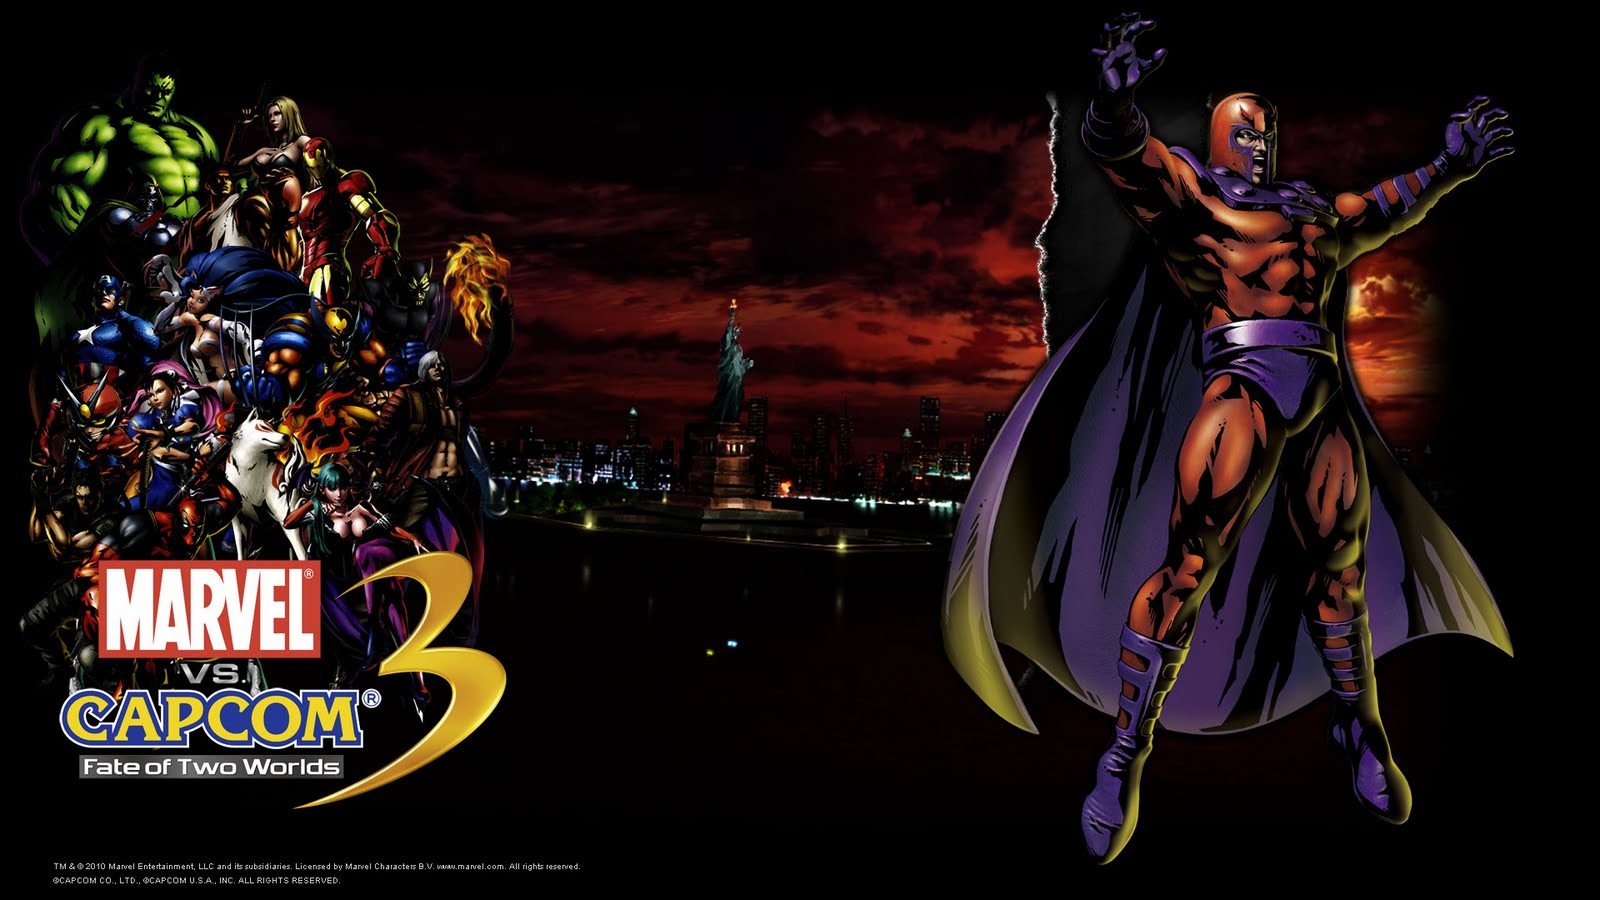 Mvc 5 background image - Magneto Mvc 3 Marvel Vs Capcom 3 Wallpaper Background